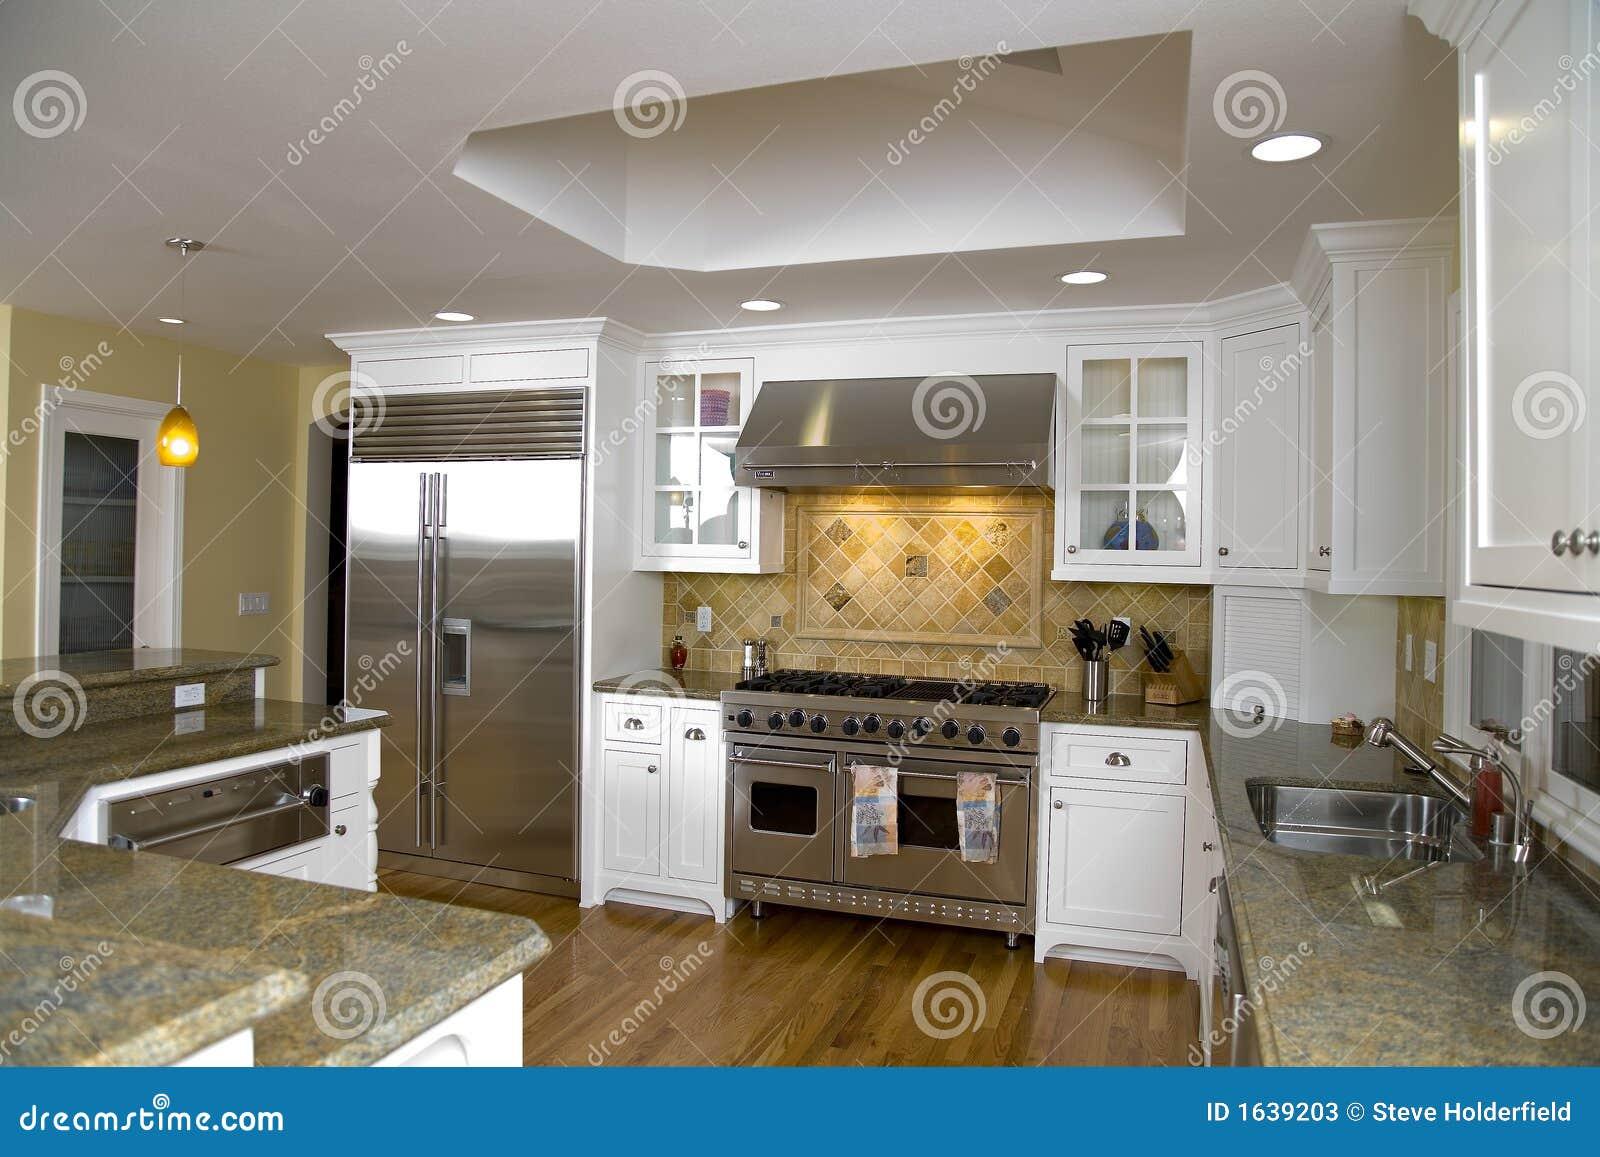 Cocina moderna lujosa remodelada fotos de archivo imagen - Fotografias de cocinas modernas ...